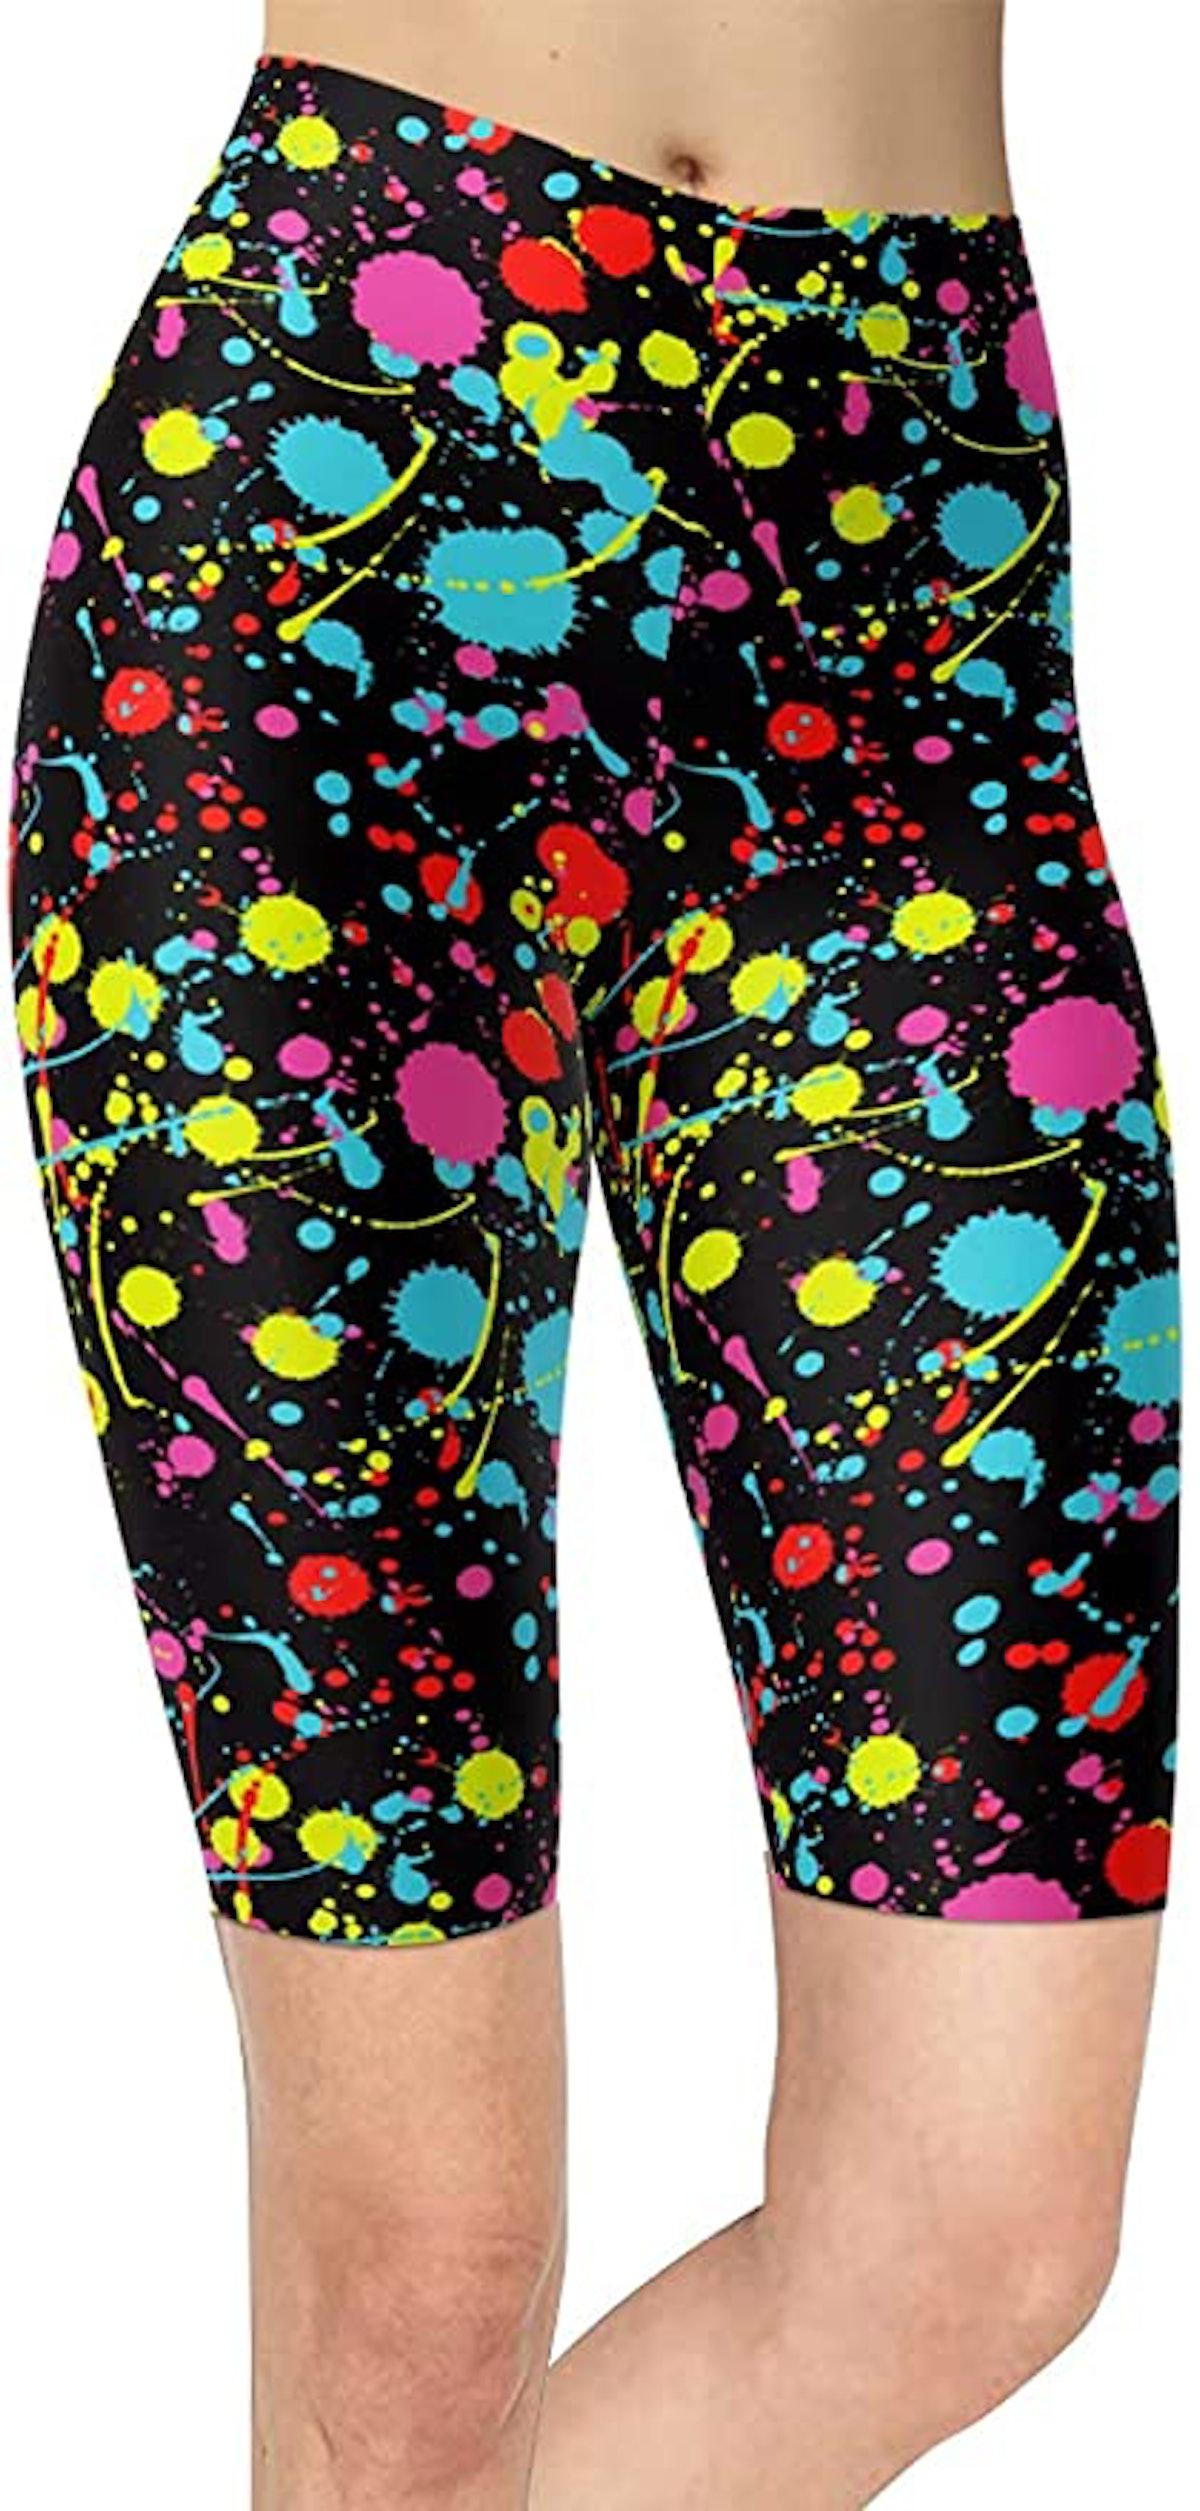 Sissycos Artistic Splash Printed Biker Shorts